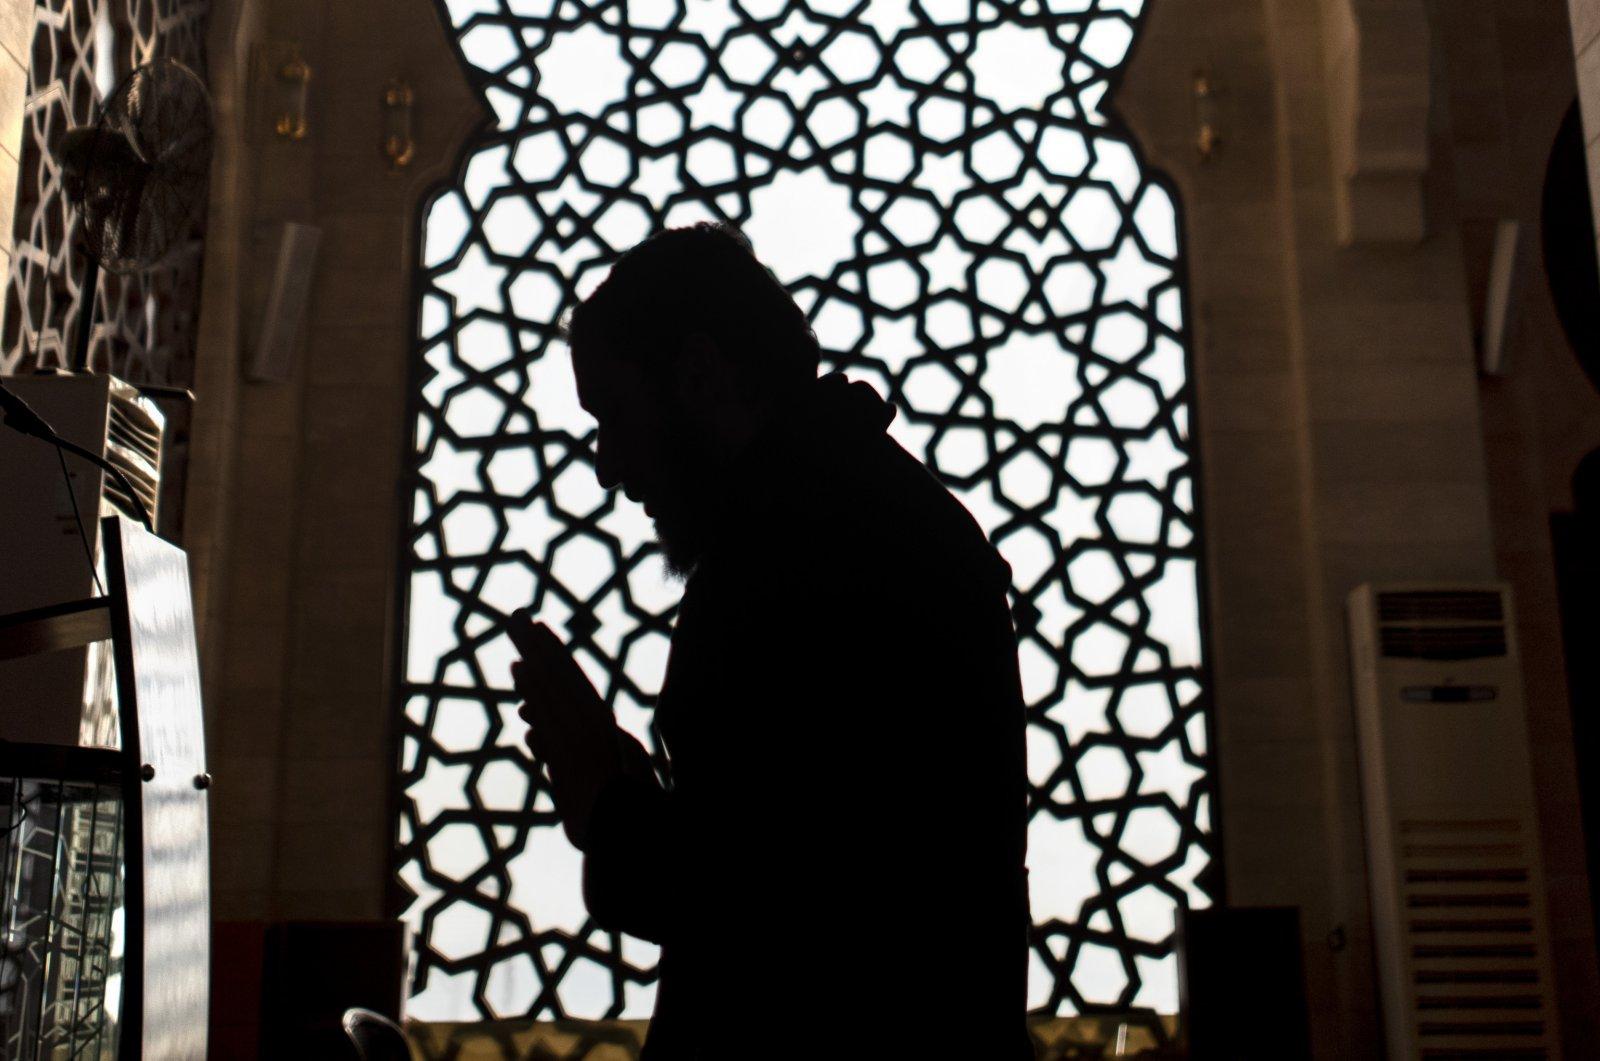 A Palestinian imam prays in a mosque during Ramadan, Gaza City, April 22, 2020. (AP Photo)